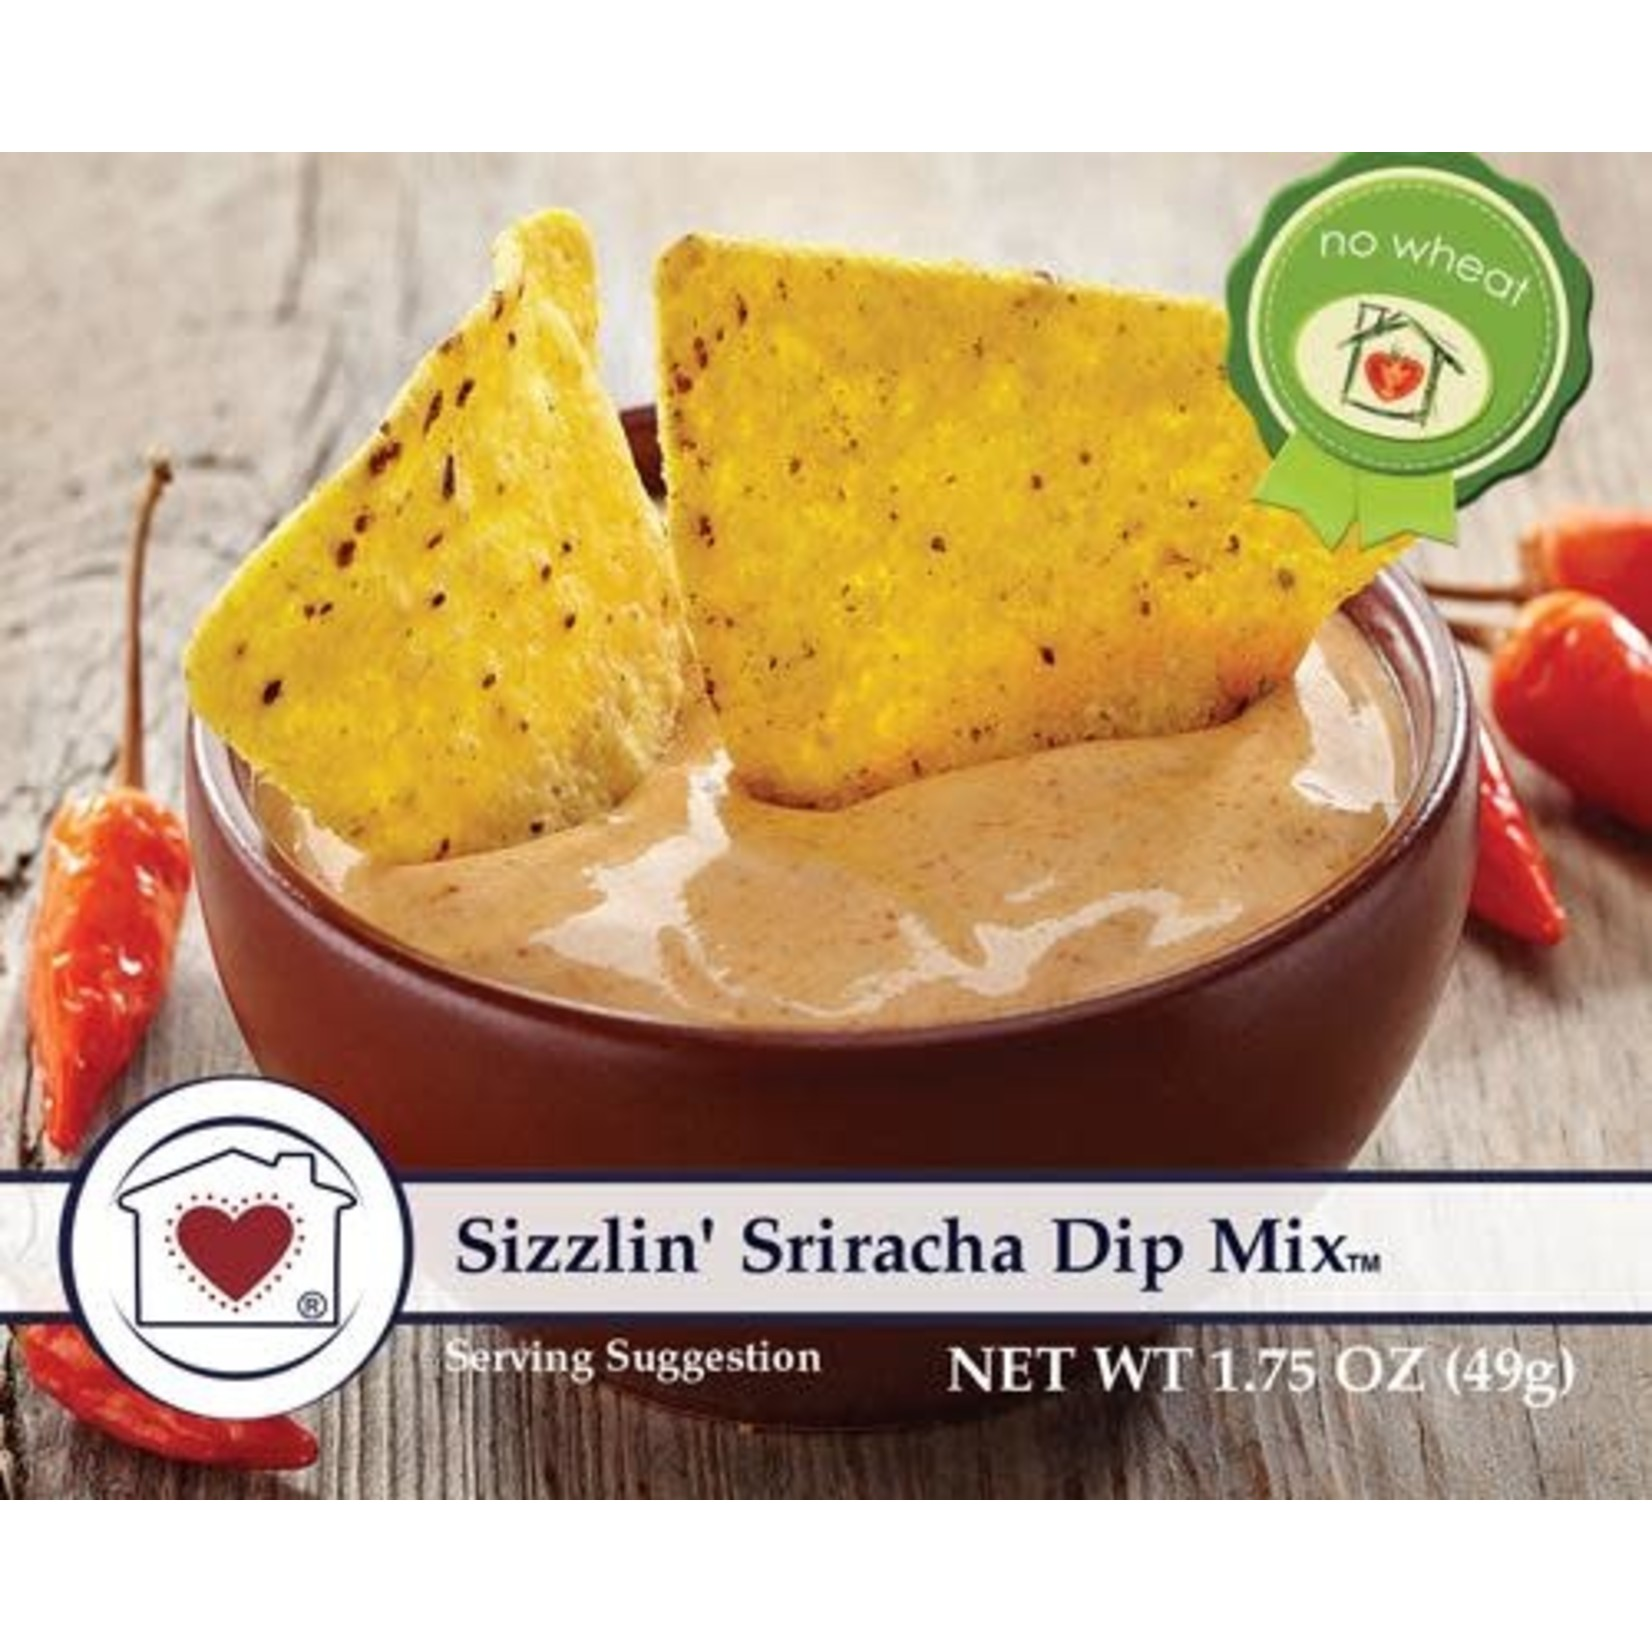 SIZZLIN SRIRACHA DIP MIX